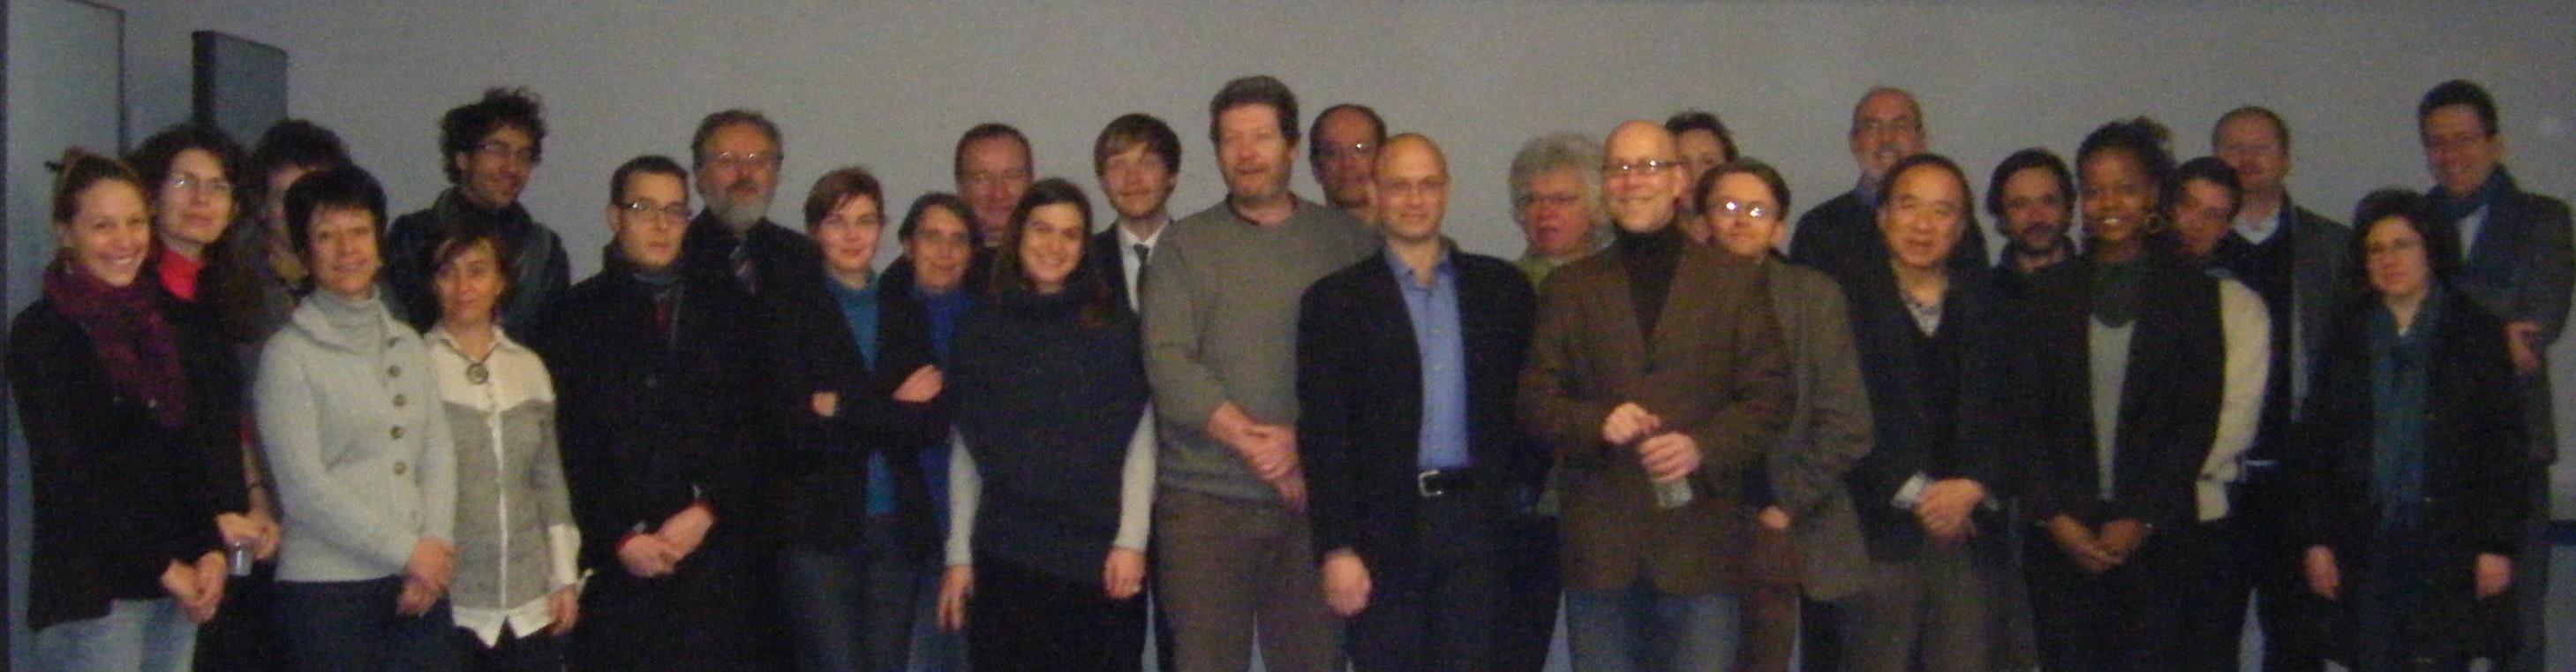 comité pilotage 2012